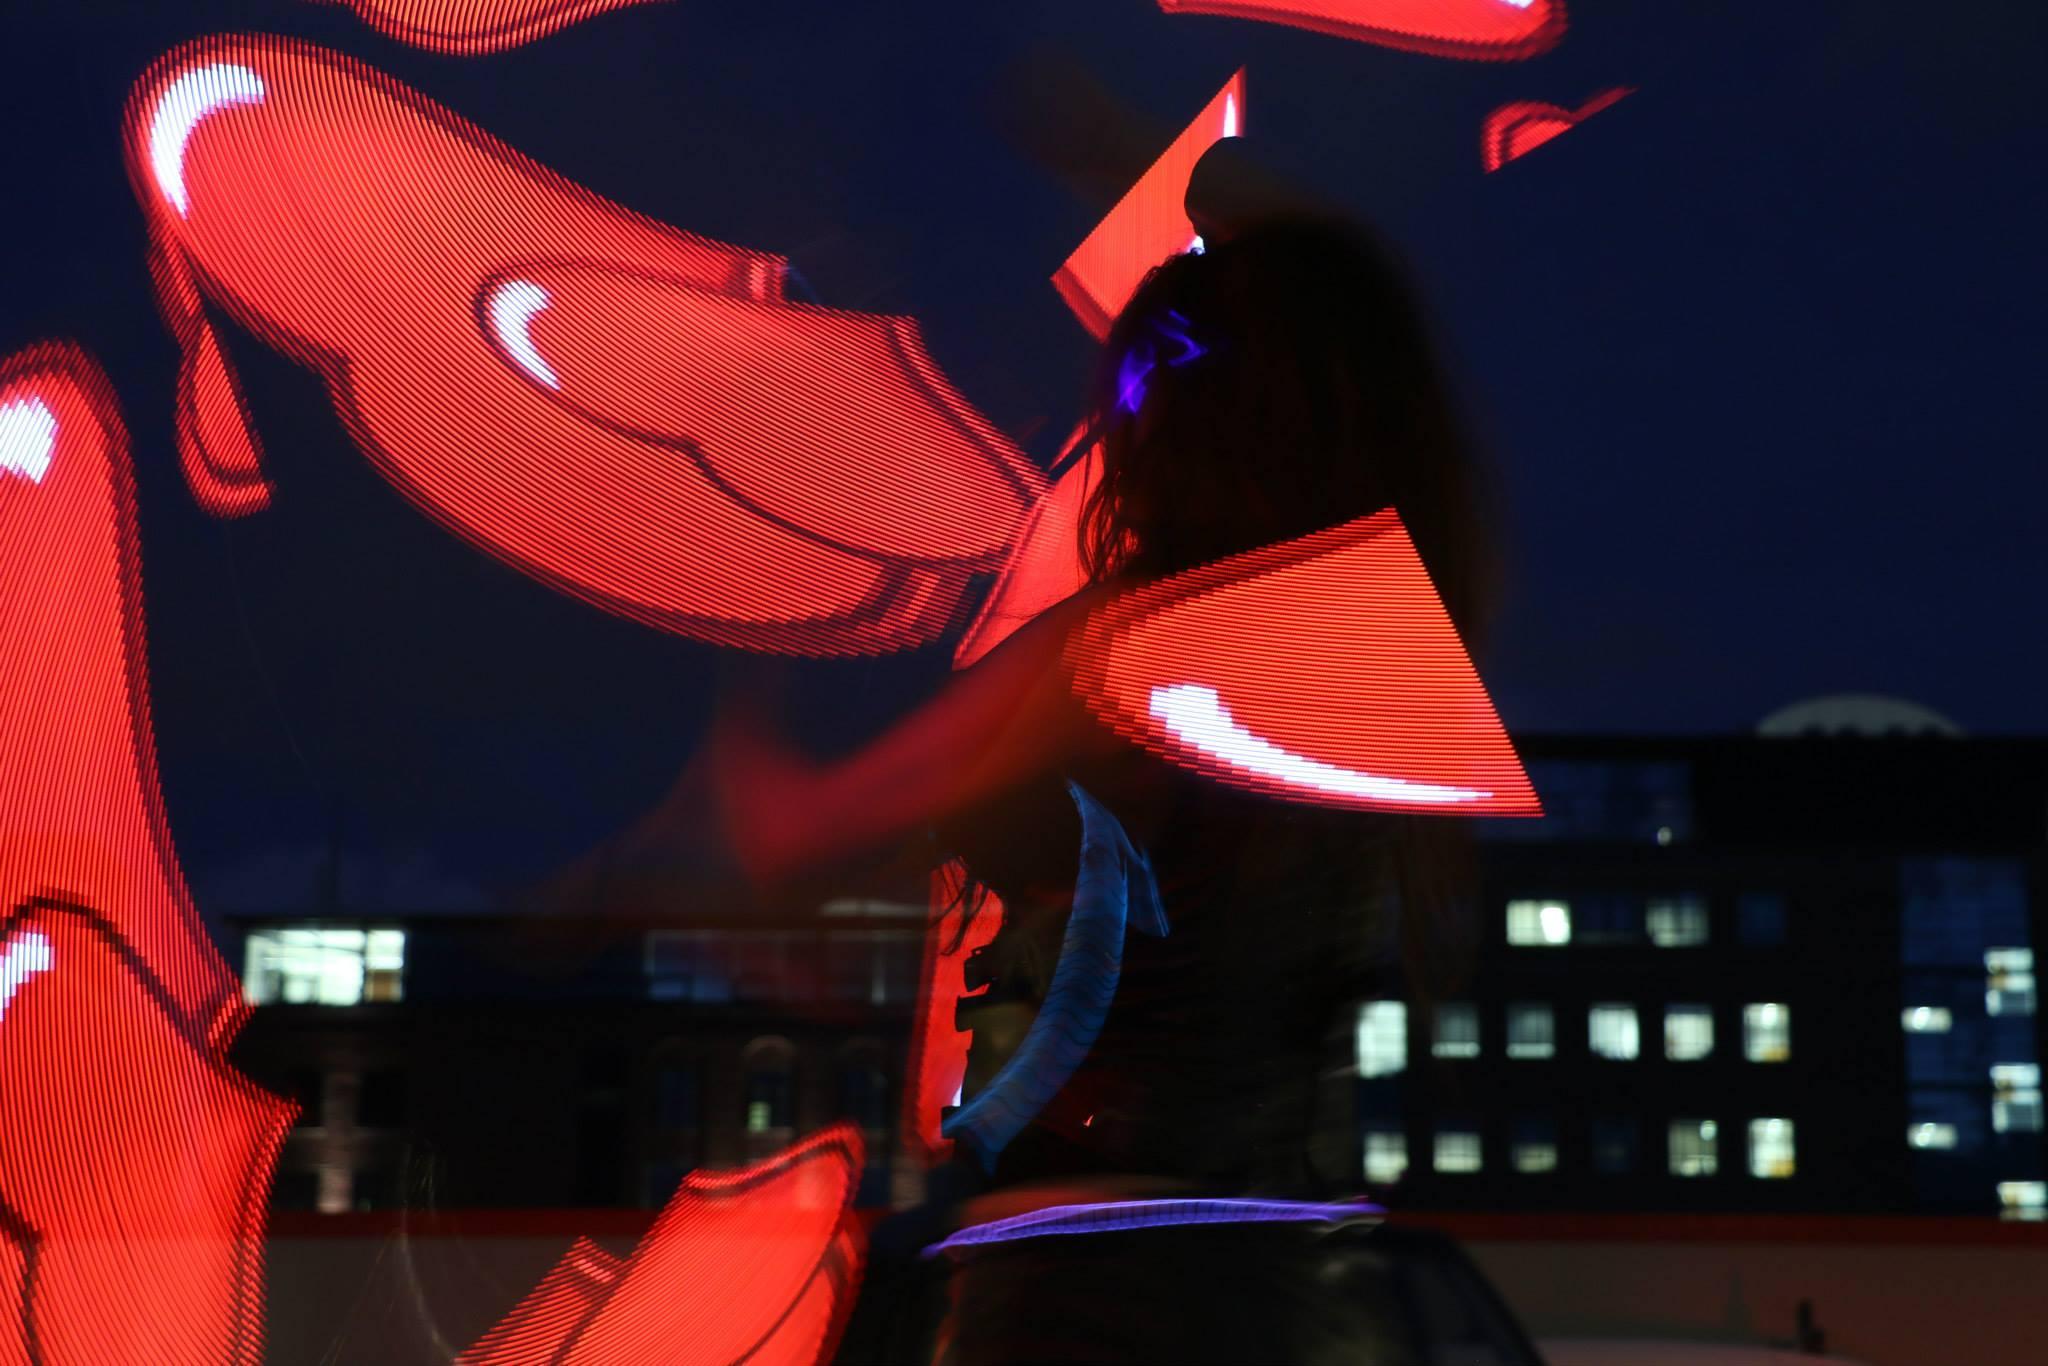 Glow Performer Sunderland